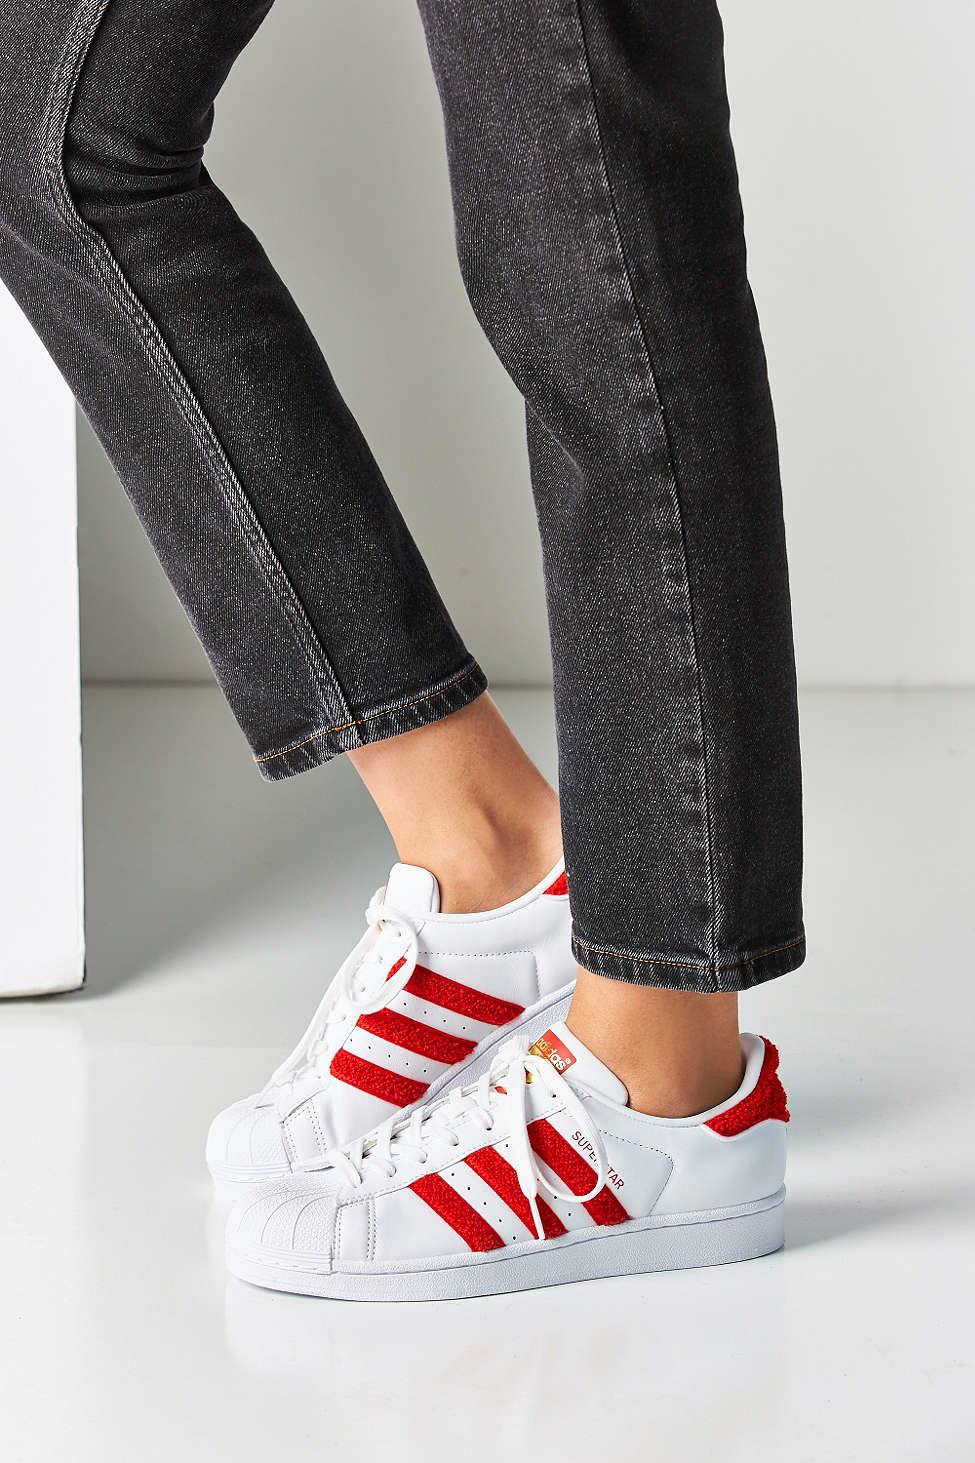 lyst adidas originali originali, superstar scarpe bianche